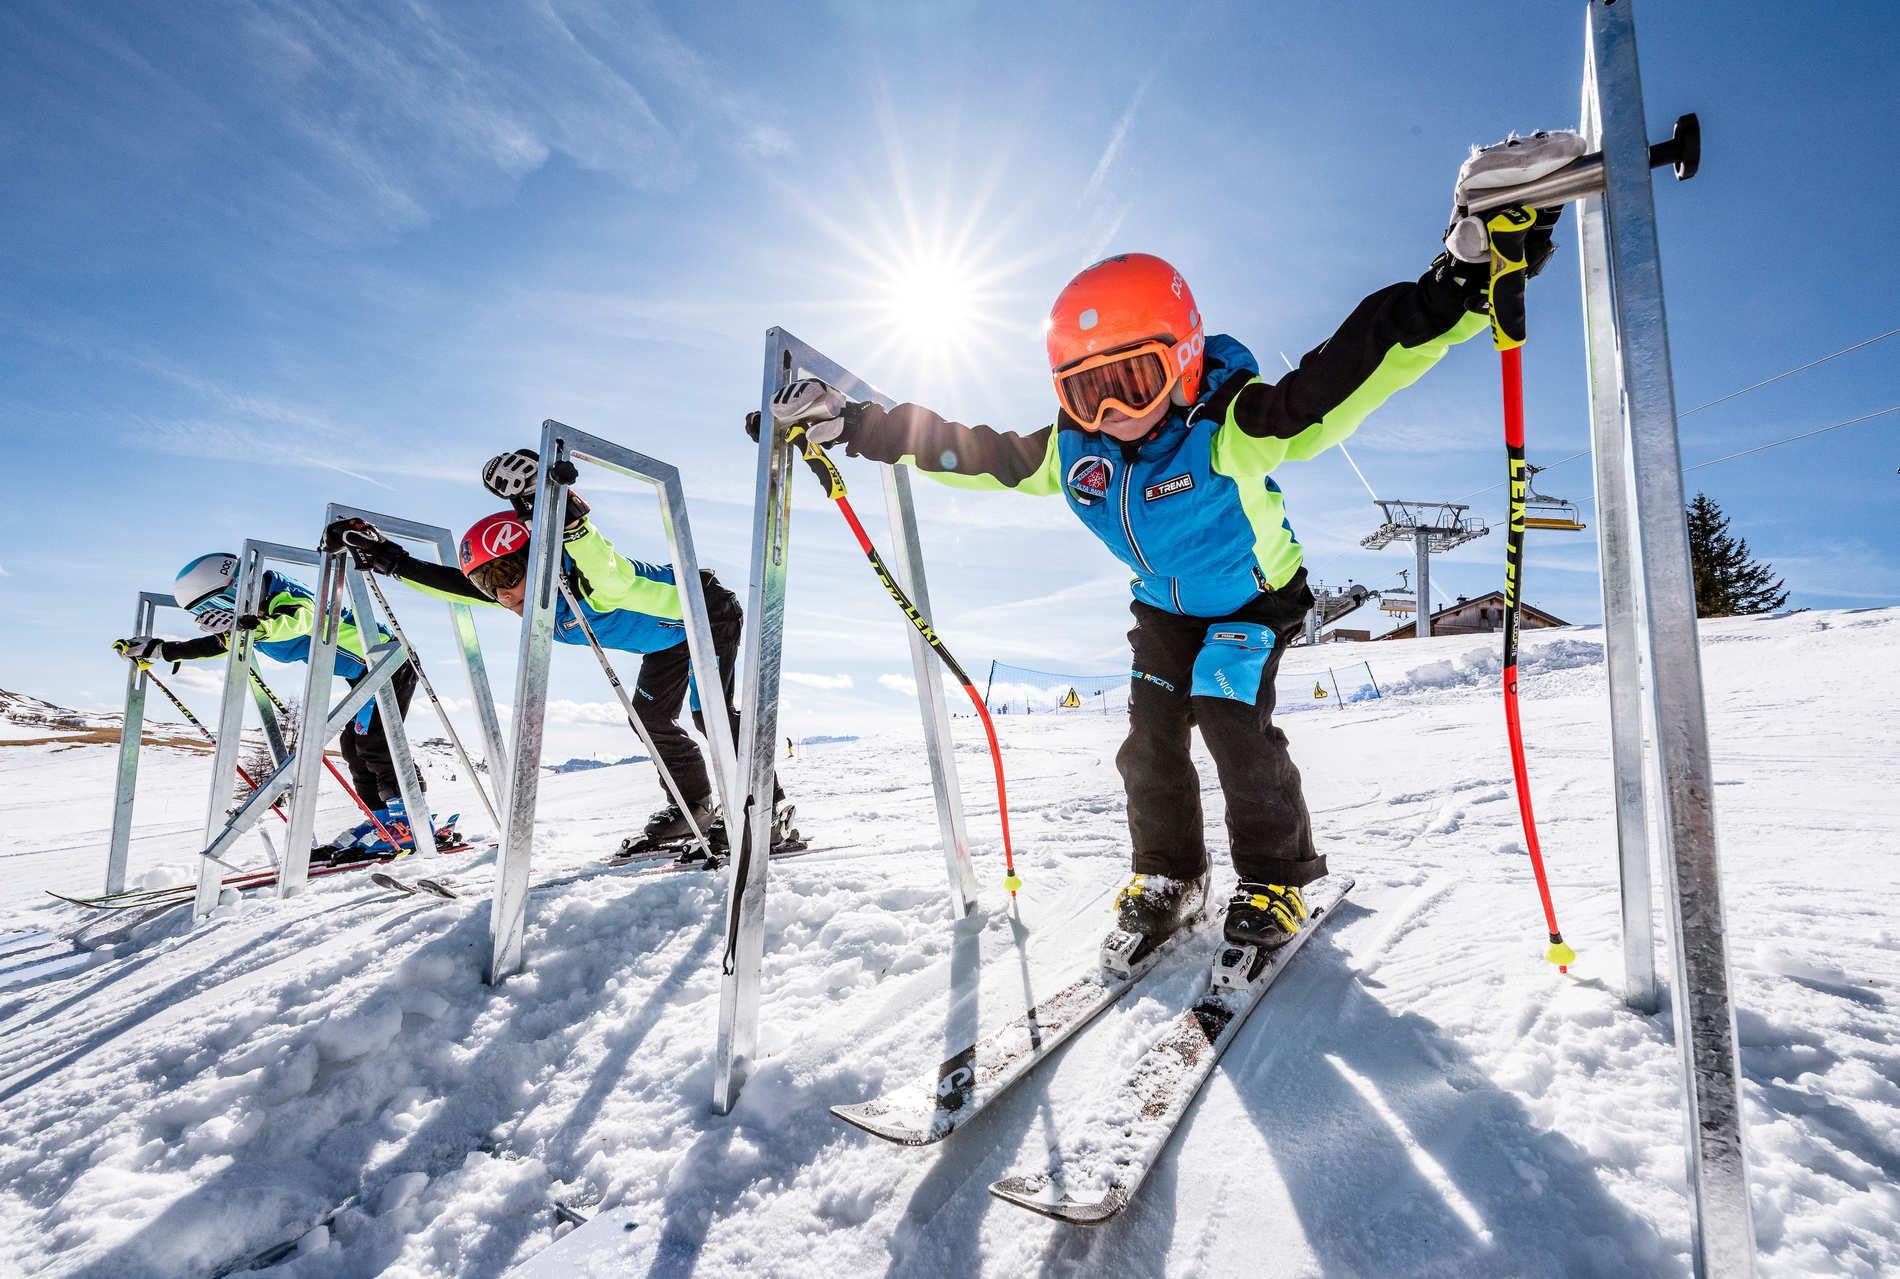 alta badia 02 03 2019 lifestyle fs christian riefenberg qparks 5